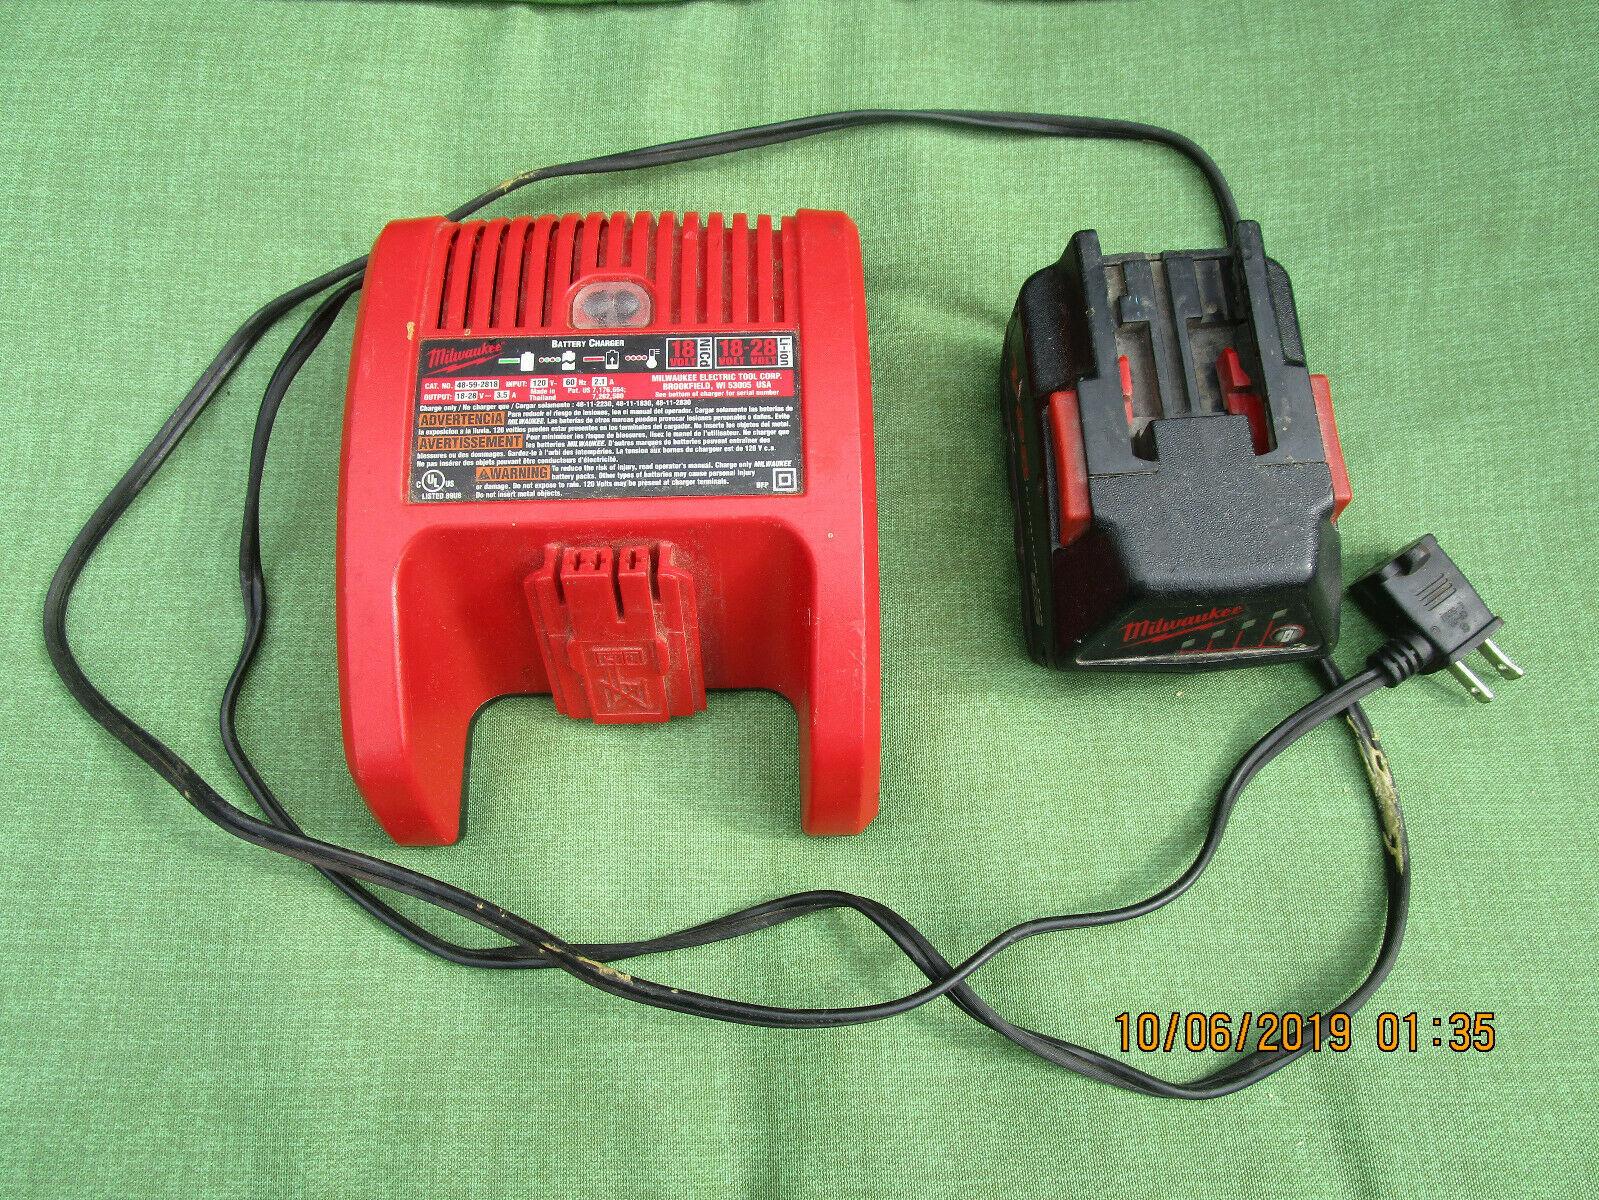 Milwaukee 48-59-2818 18-28 Volt Li-on Battery/Battery Charger - $57.99